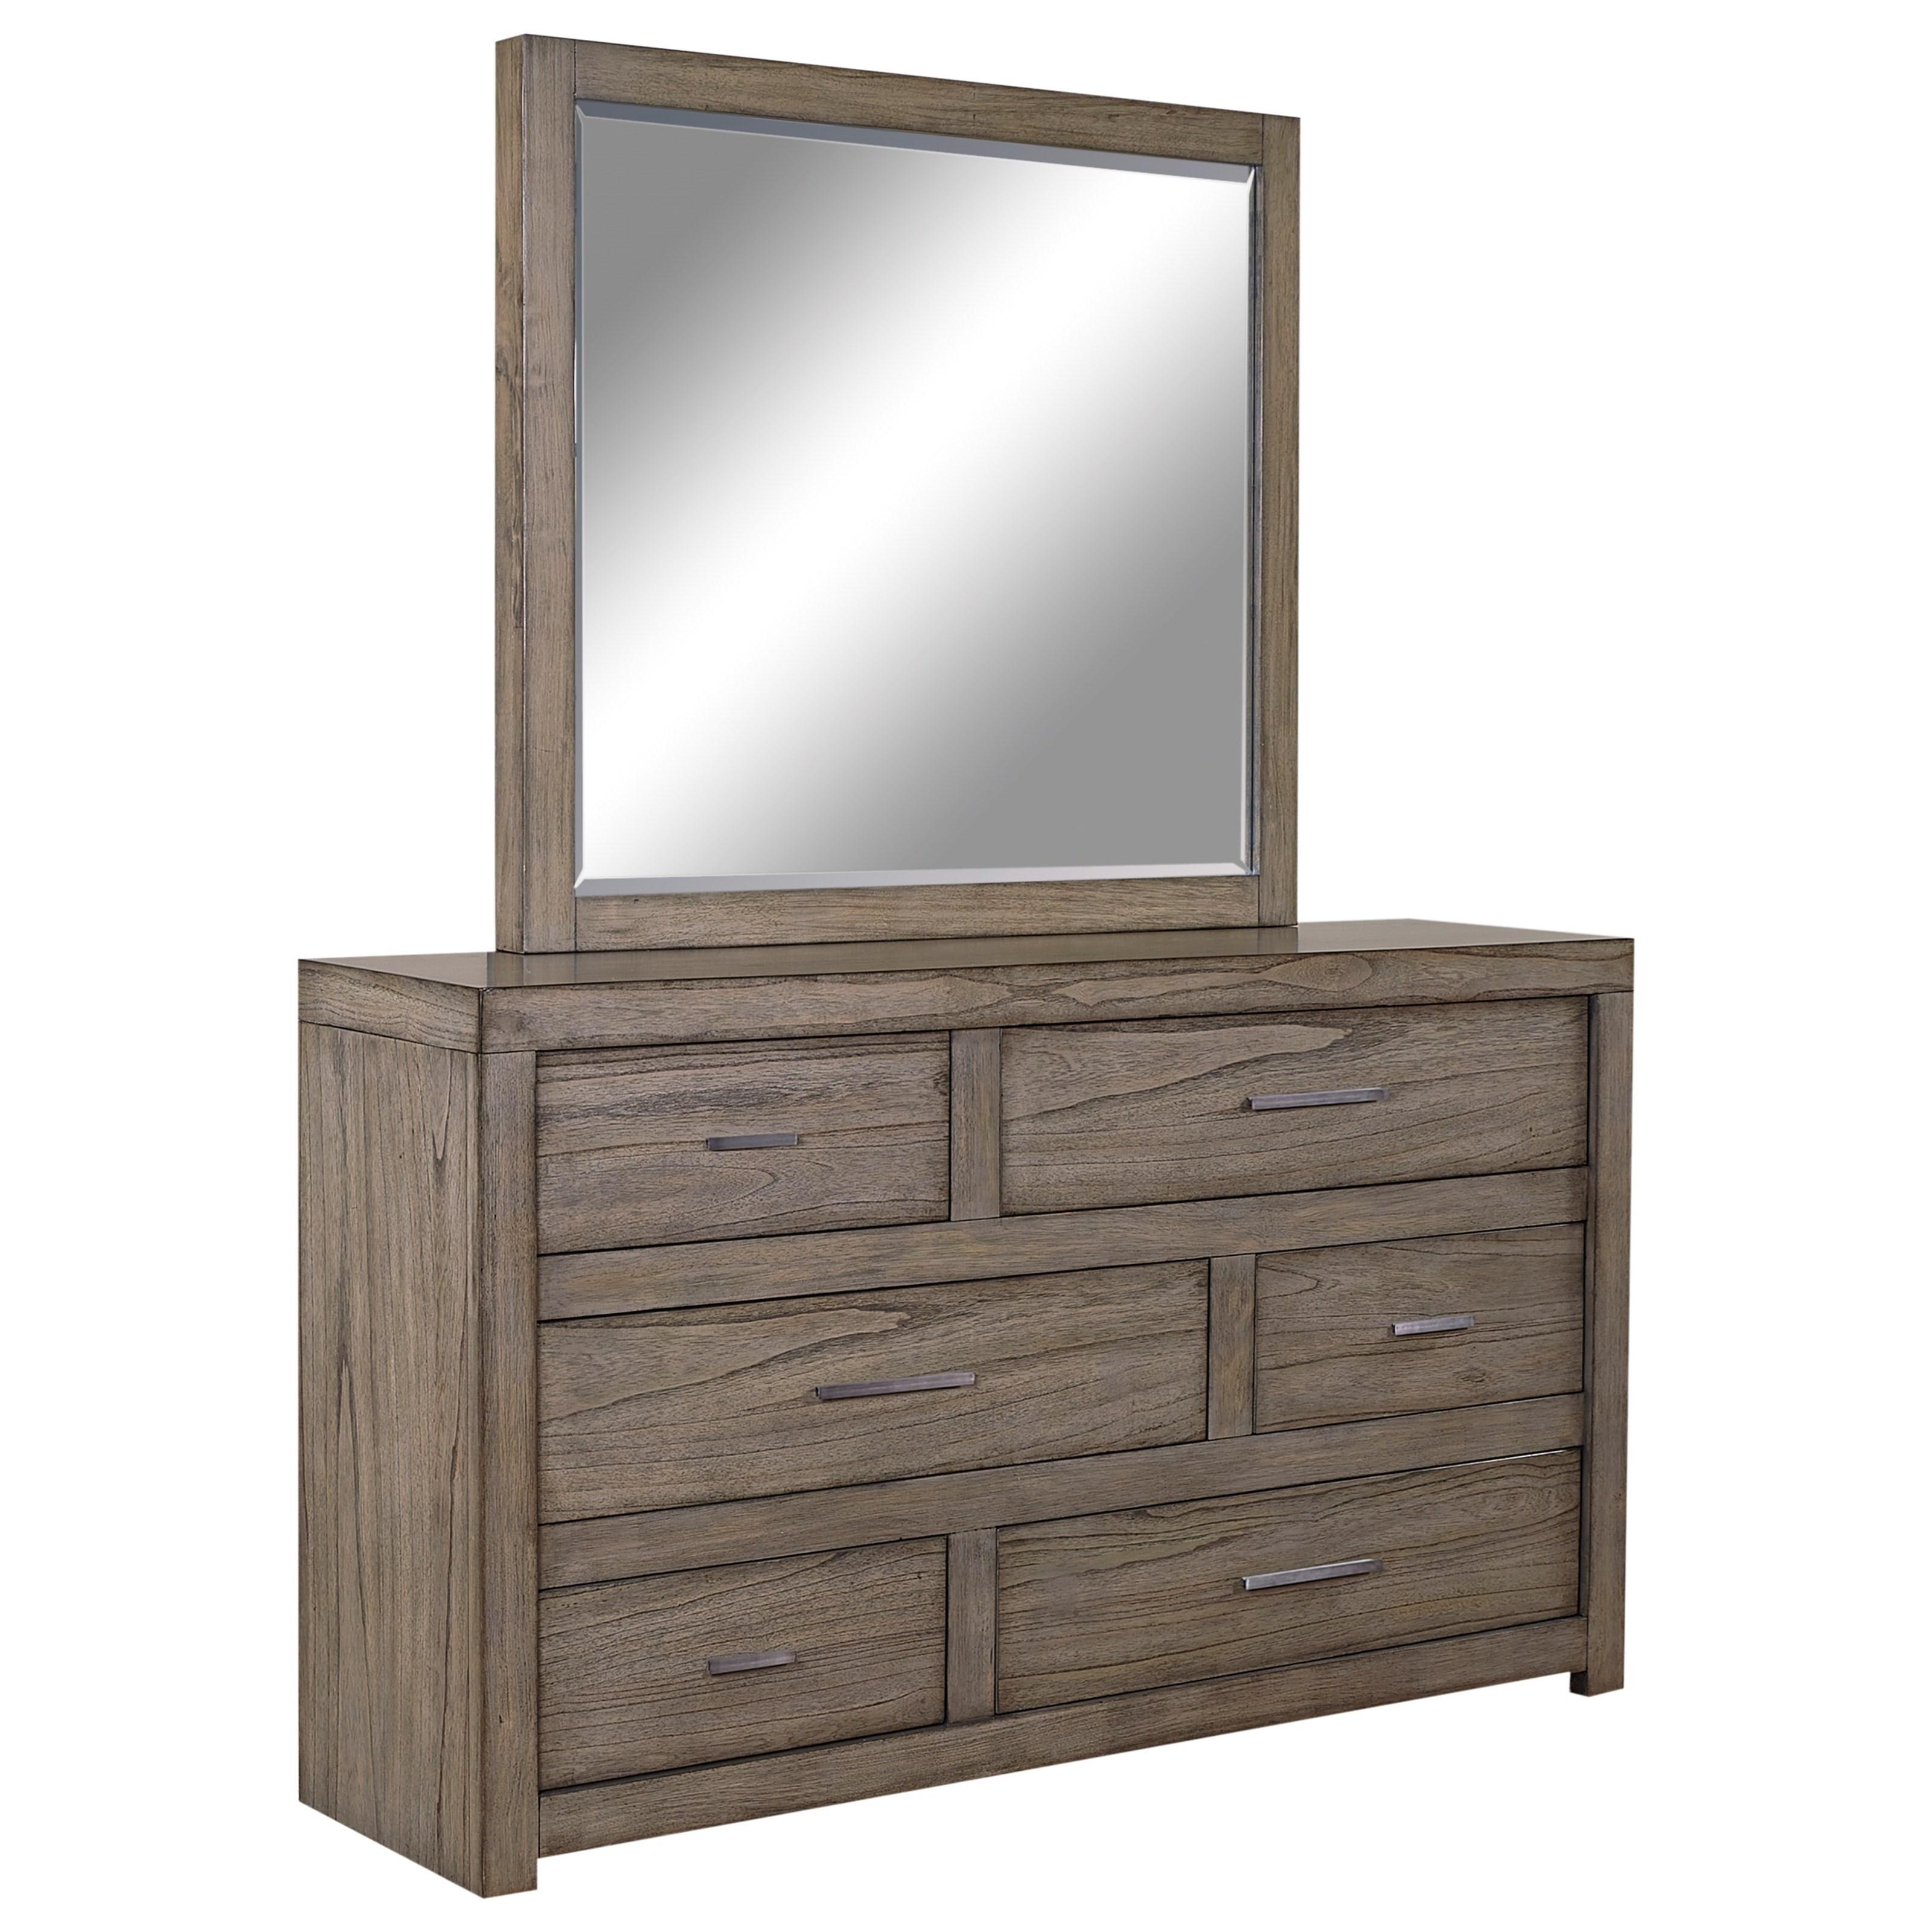 Urbanite Dresser and Mirror Set by Aspenhome at Crowley Furniture & Mattress